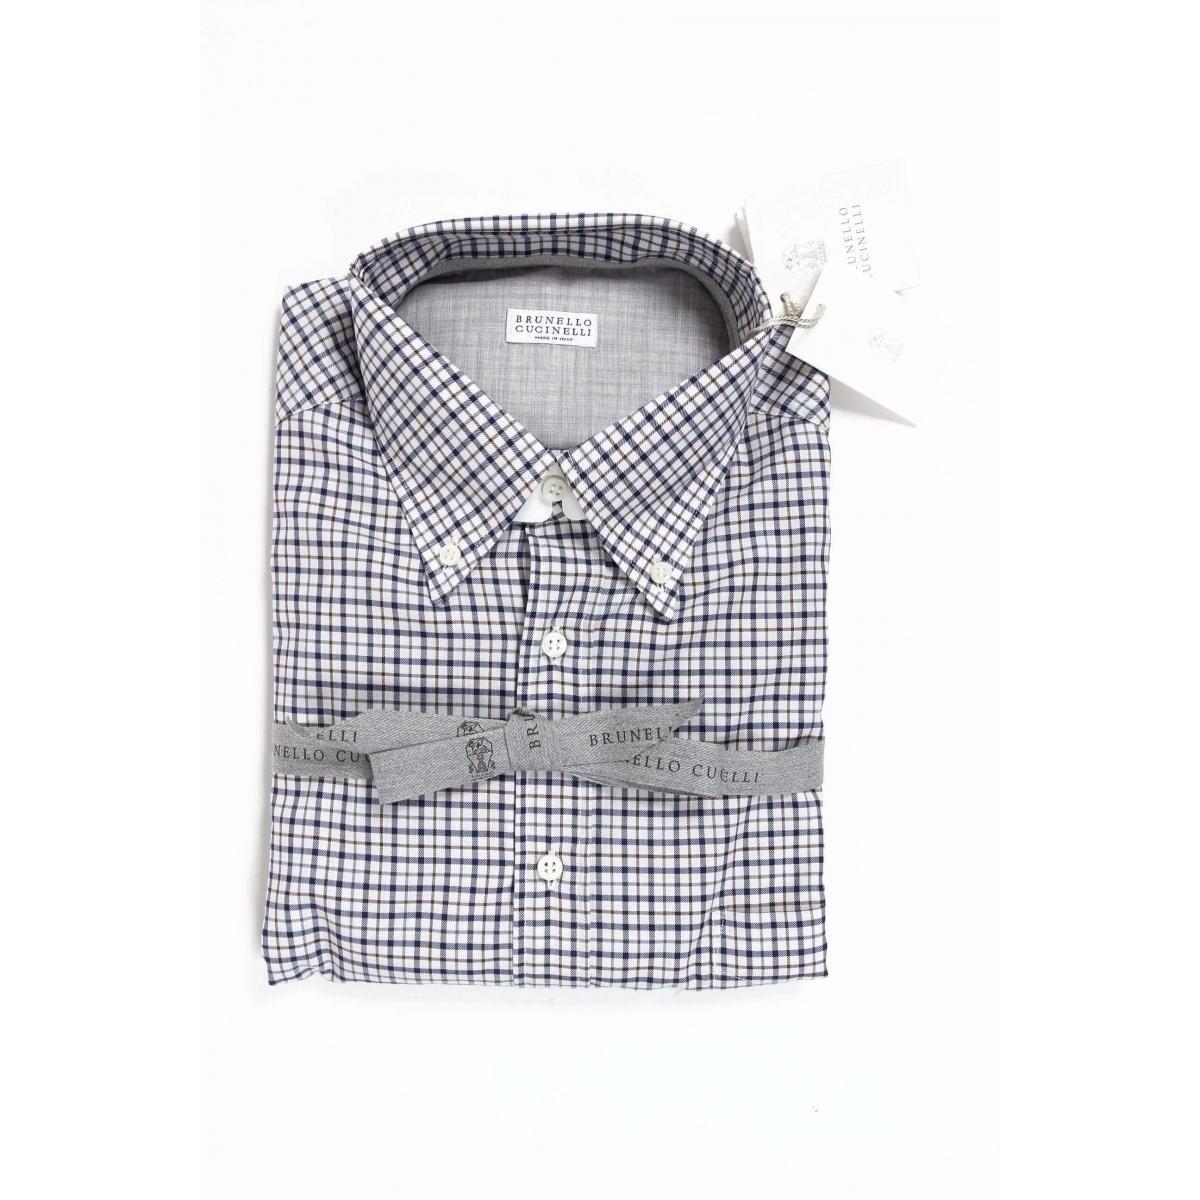 Brunello Cucinelli Mens Shirt MA6490068 C019